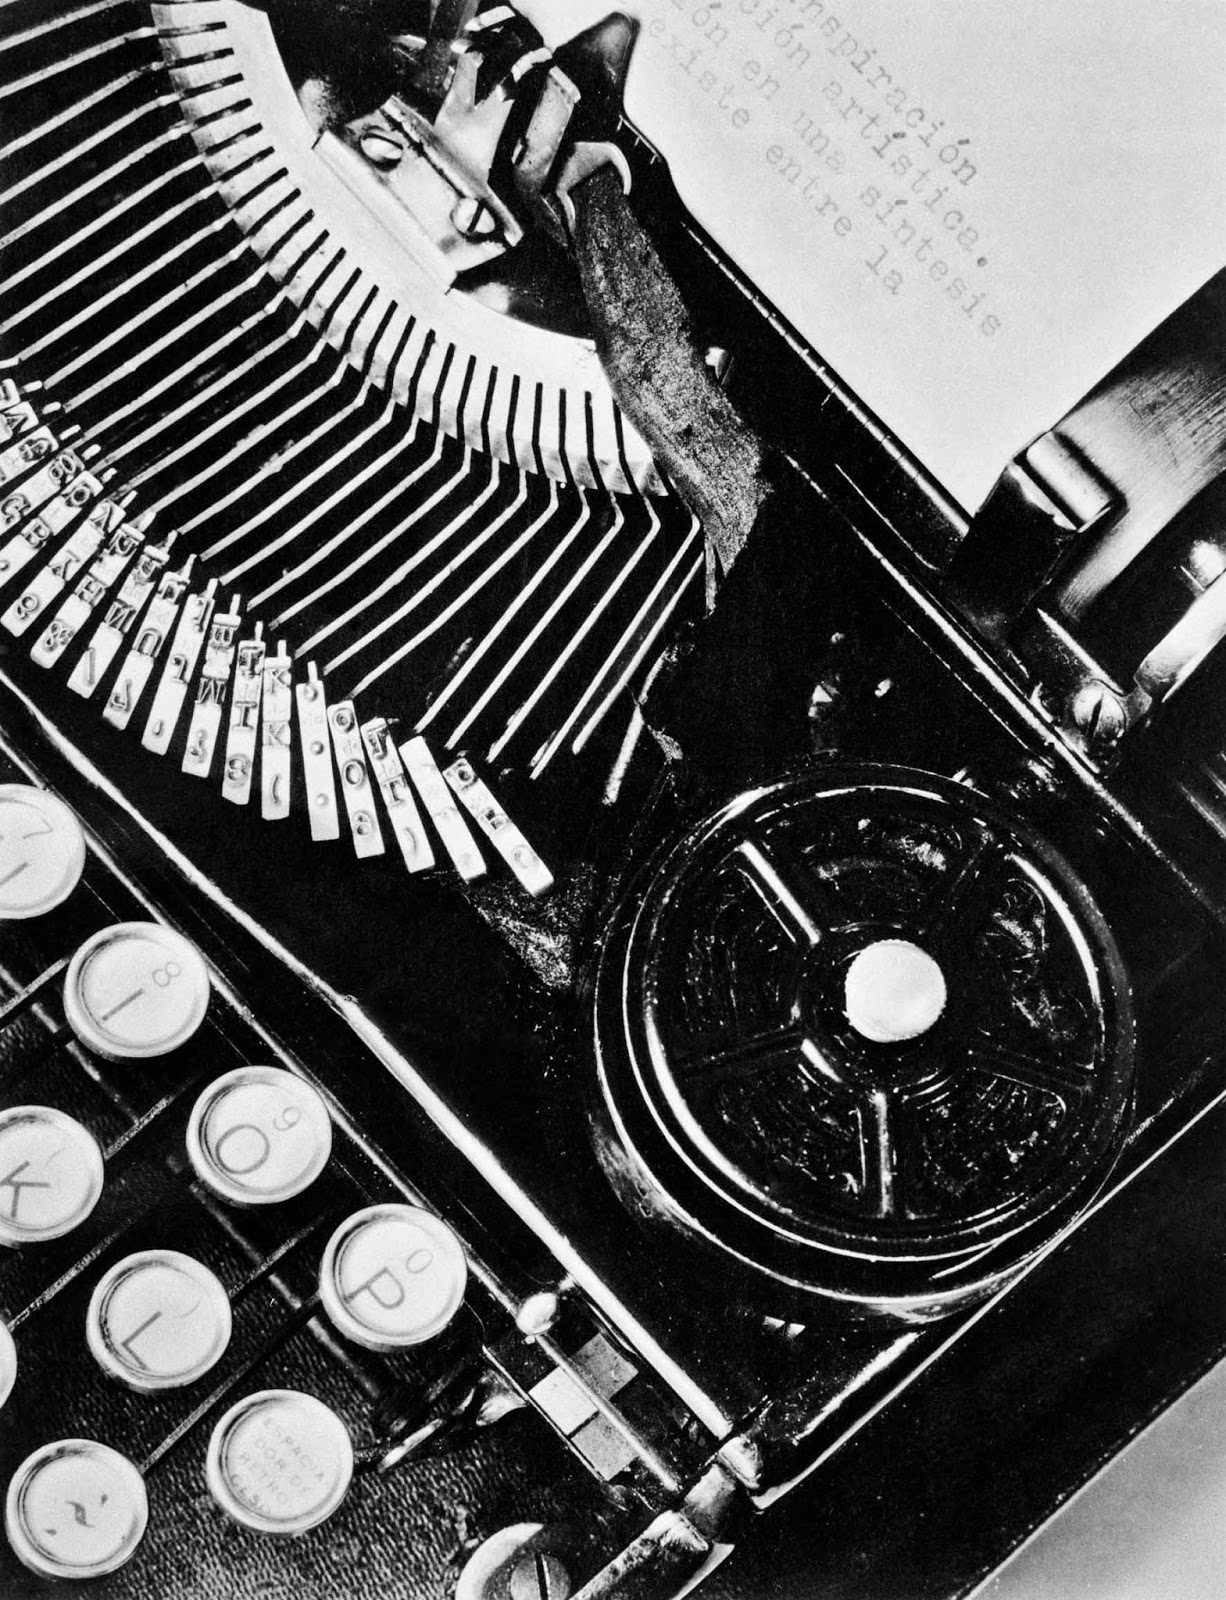 T. MODOTTI (1896-1942), La Tecnica, machine à écrire de Julio Antonio Mella, Mexique, 1928, épreuve gélatino-argentique, 23,5 x 19 cm, New York, Throckmorton Fine Art